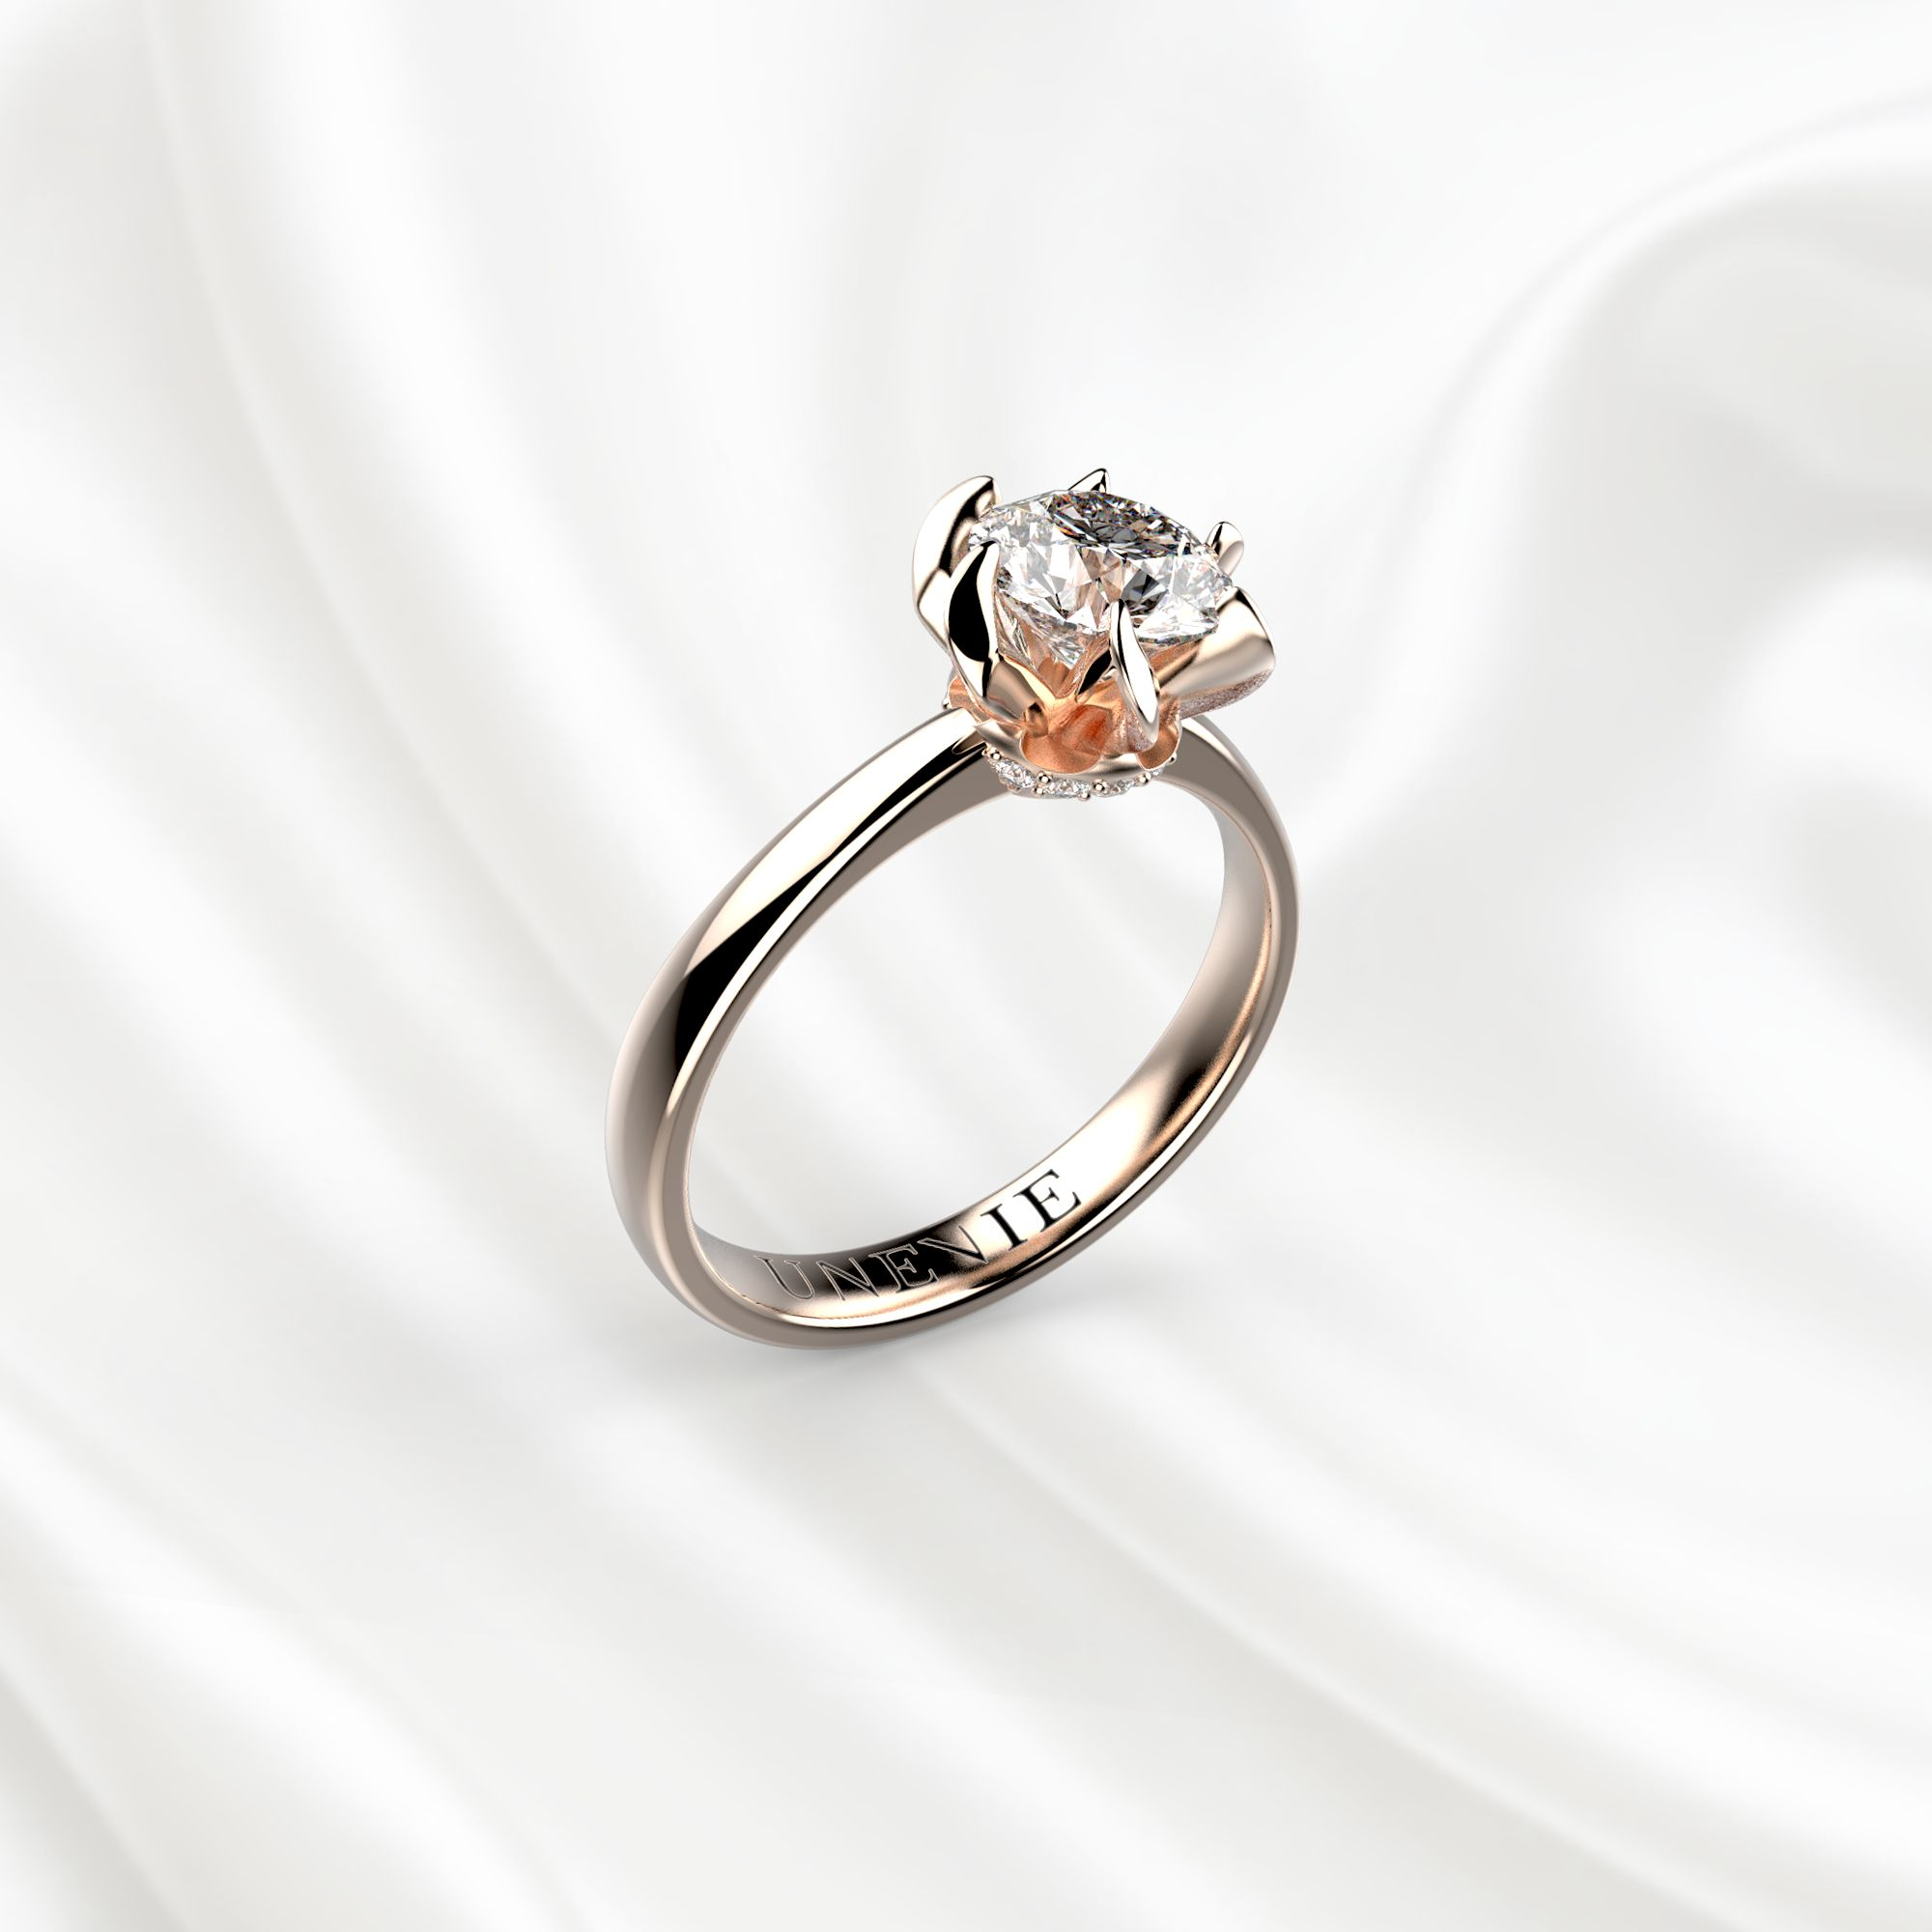 N11 Помолвочное кольцо из розового золота с бриллиантом 0.7 карат